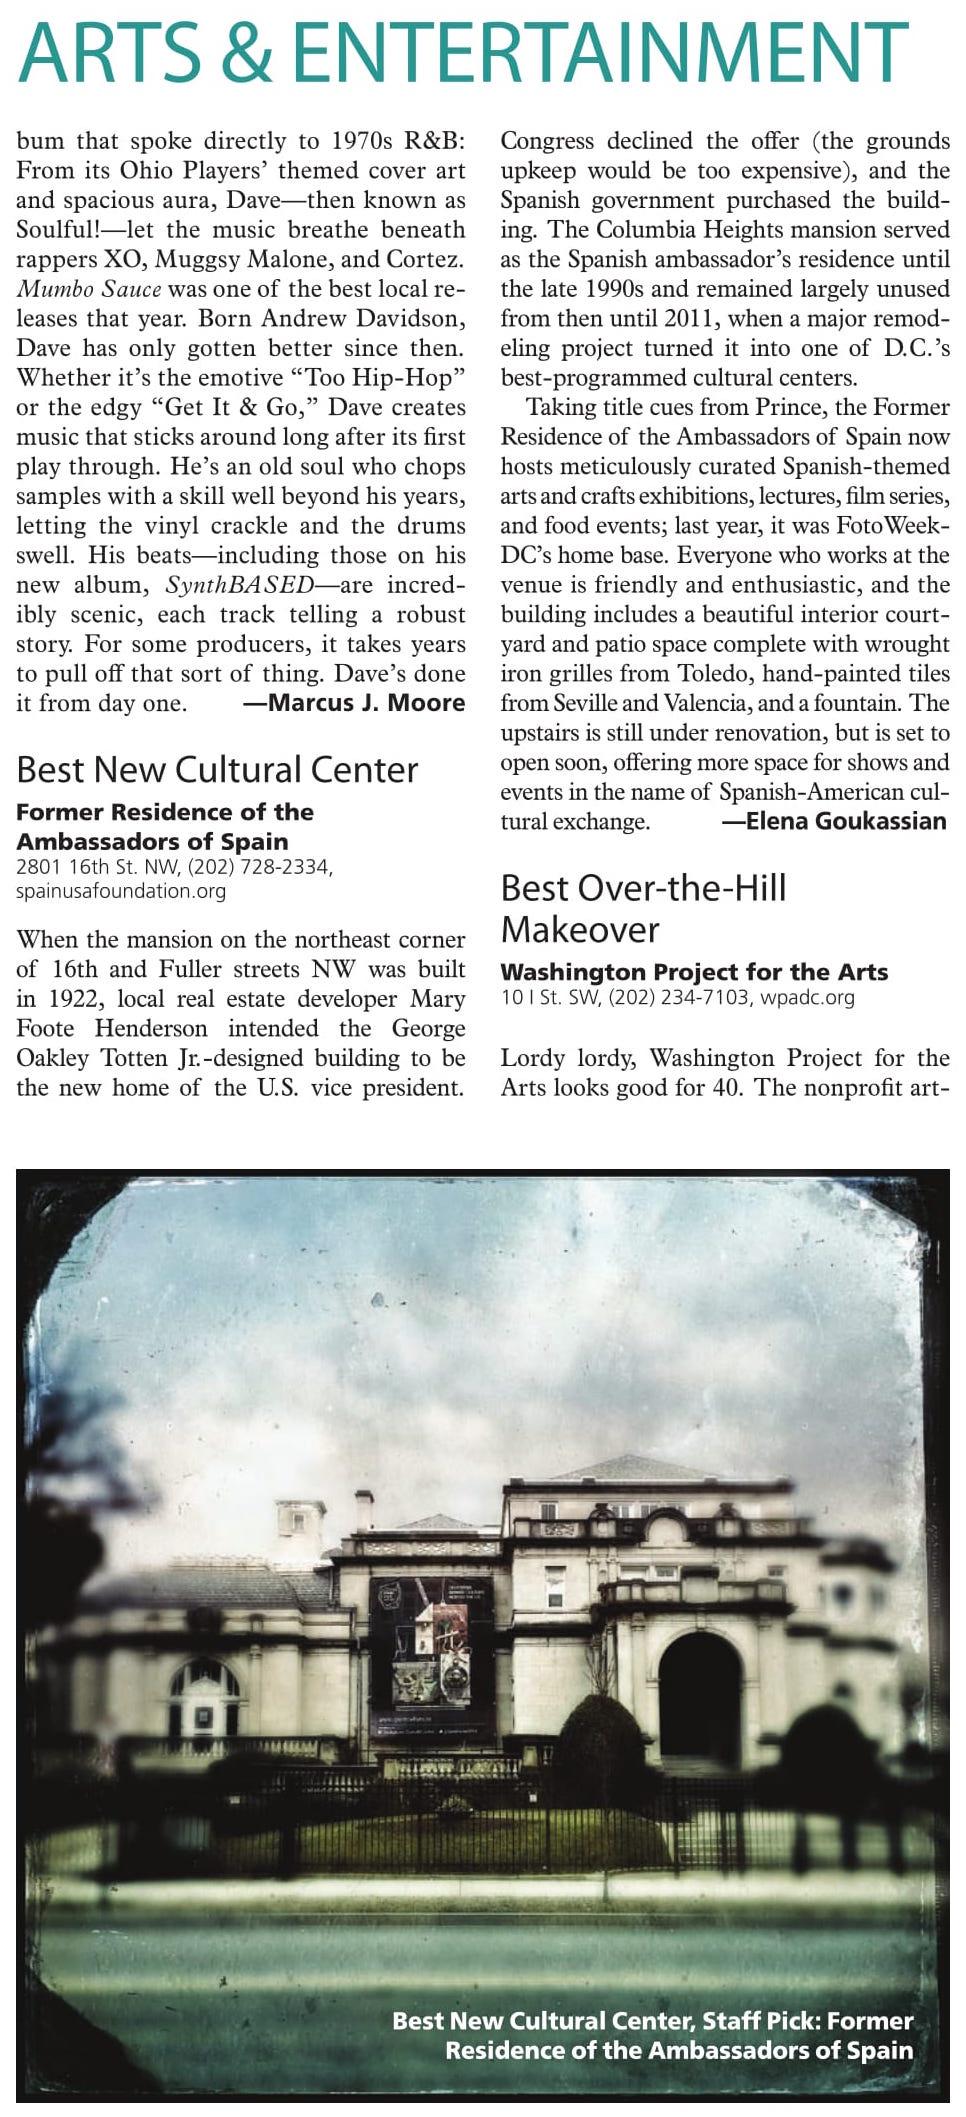 http://legacy.washingtoncitypaper.com/bestofdc/artsandentertainment/2015/best-new-cultural-center